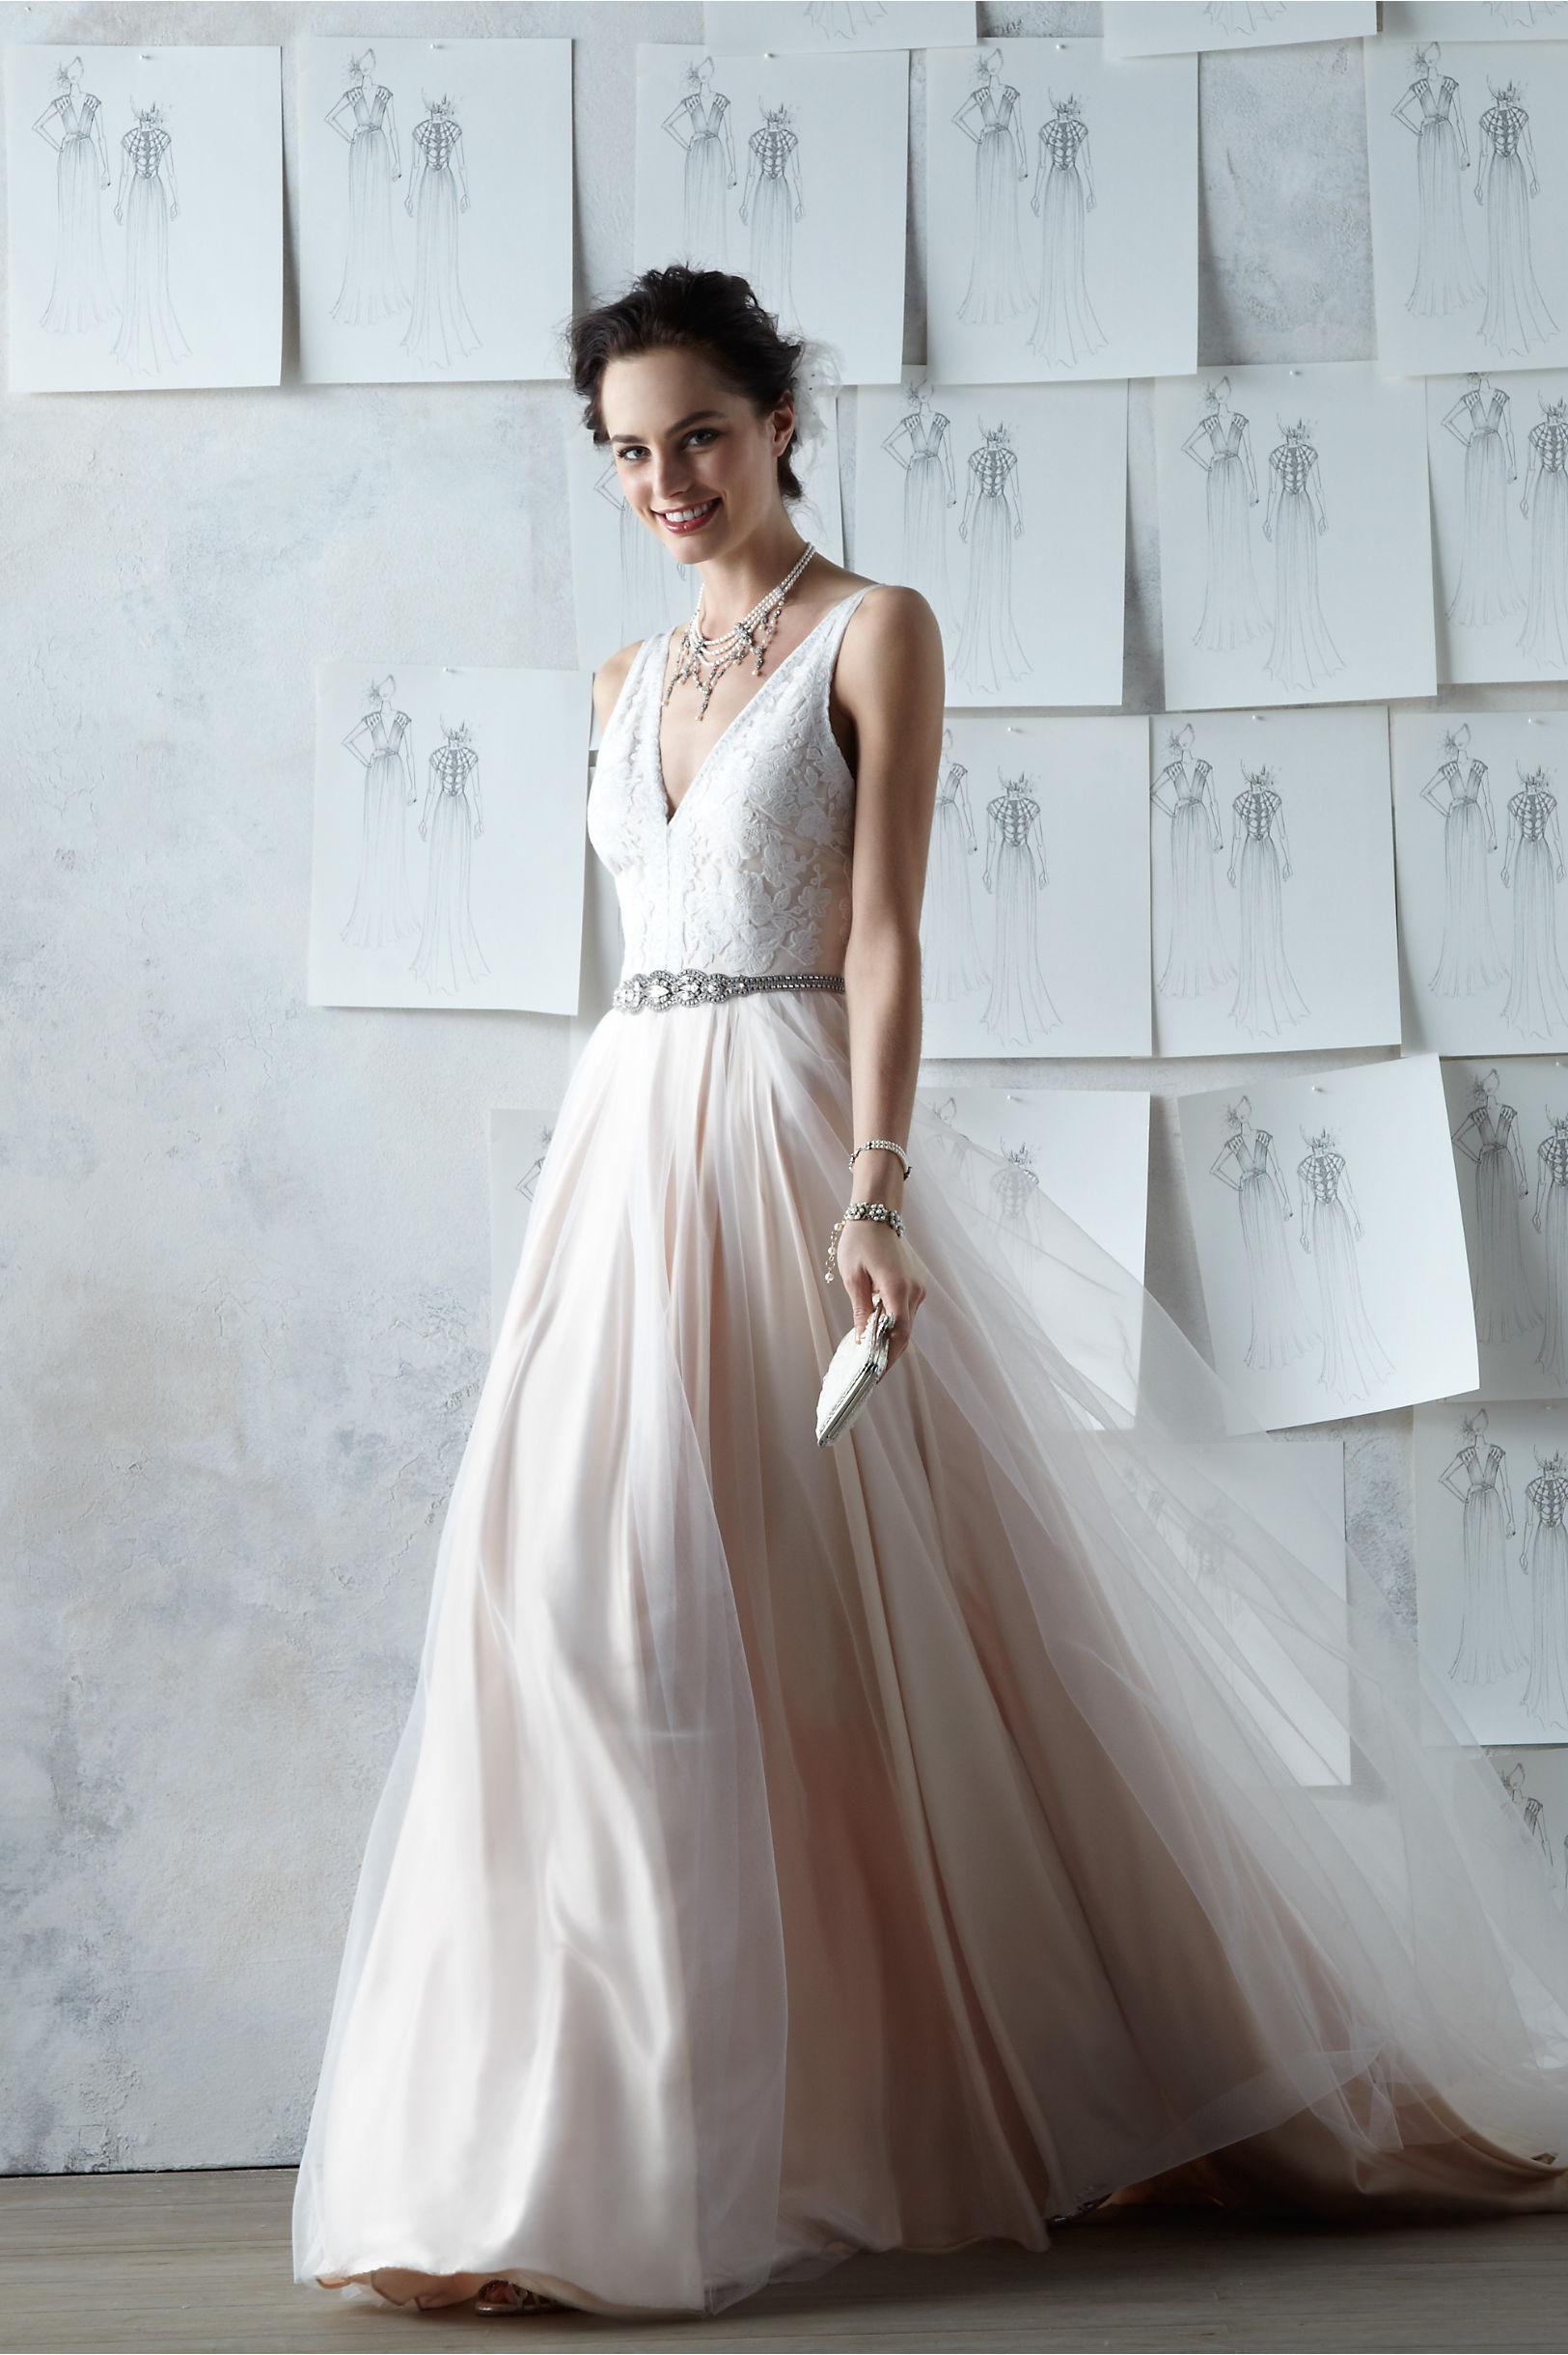 Modern Wedding Dresses Backless : Modern backless wedding gowns cheap beach plus size dresses